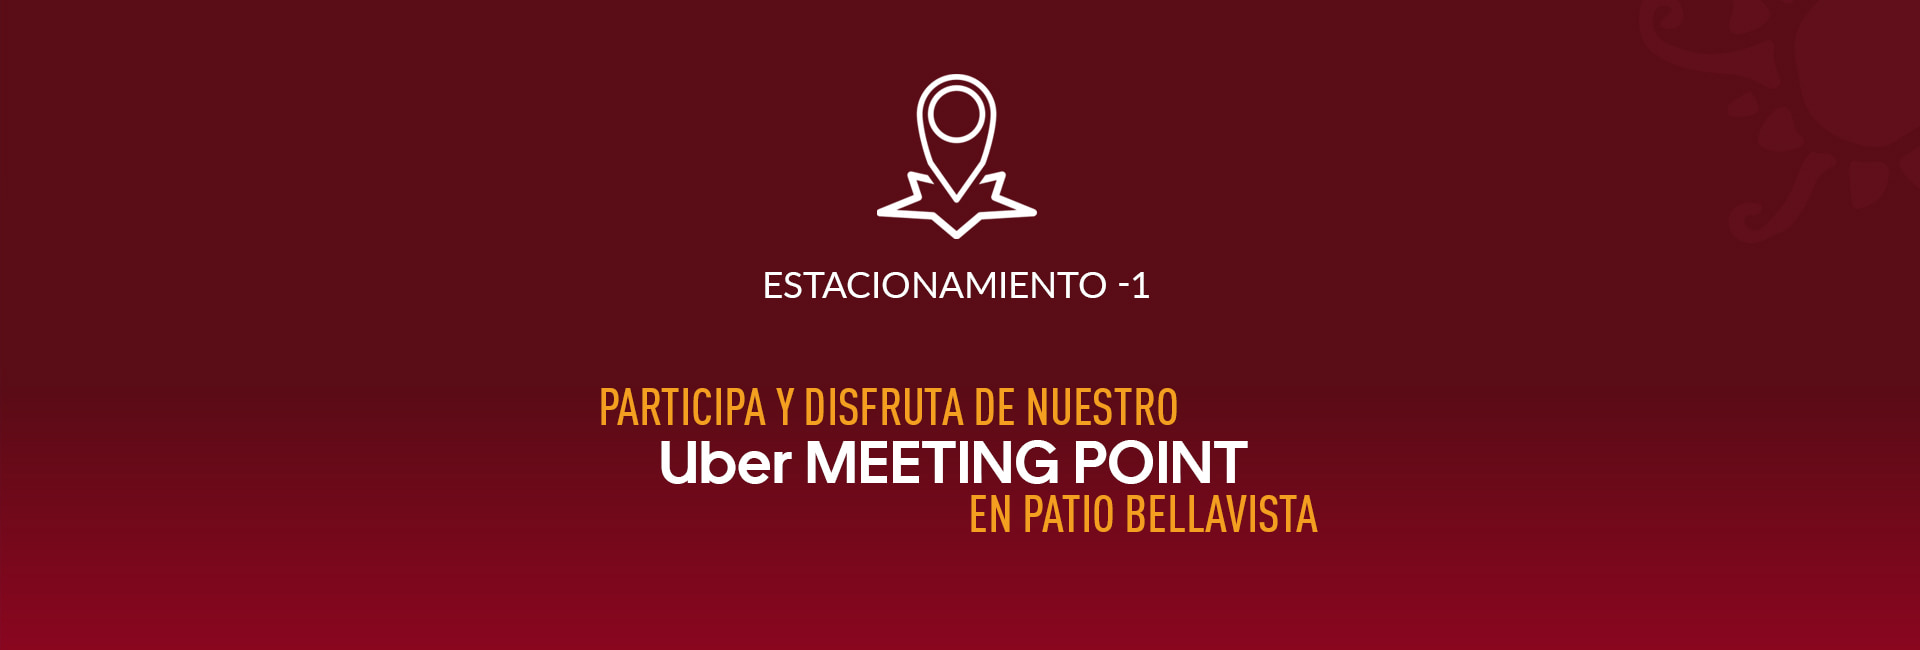 Experiencia Uber